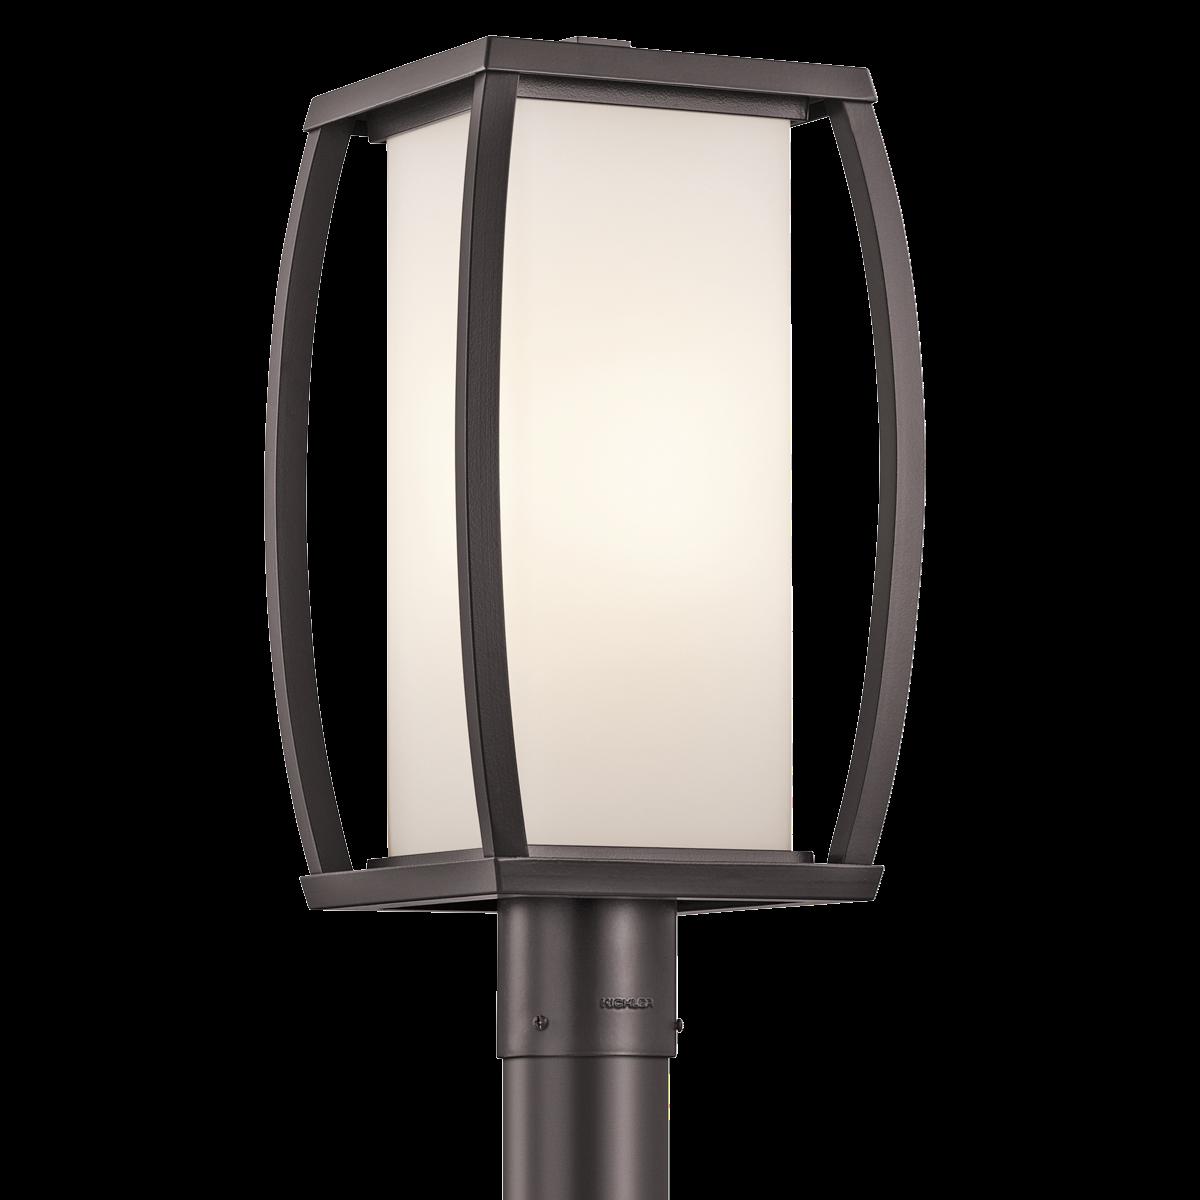 Post lt az loading. Lamp clipart outdoor lamp